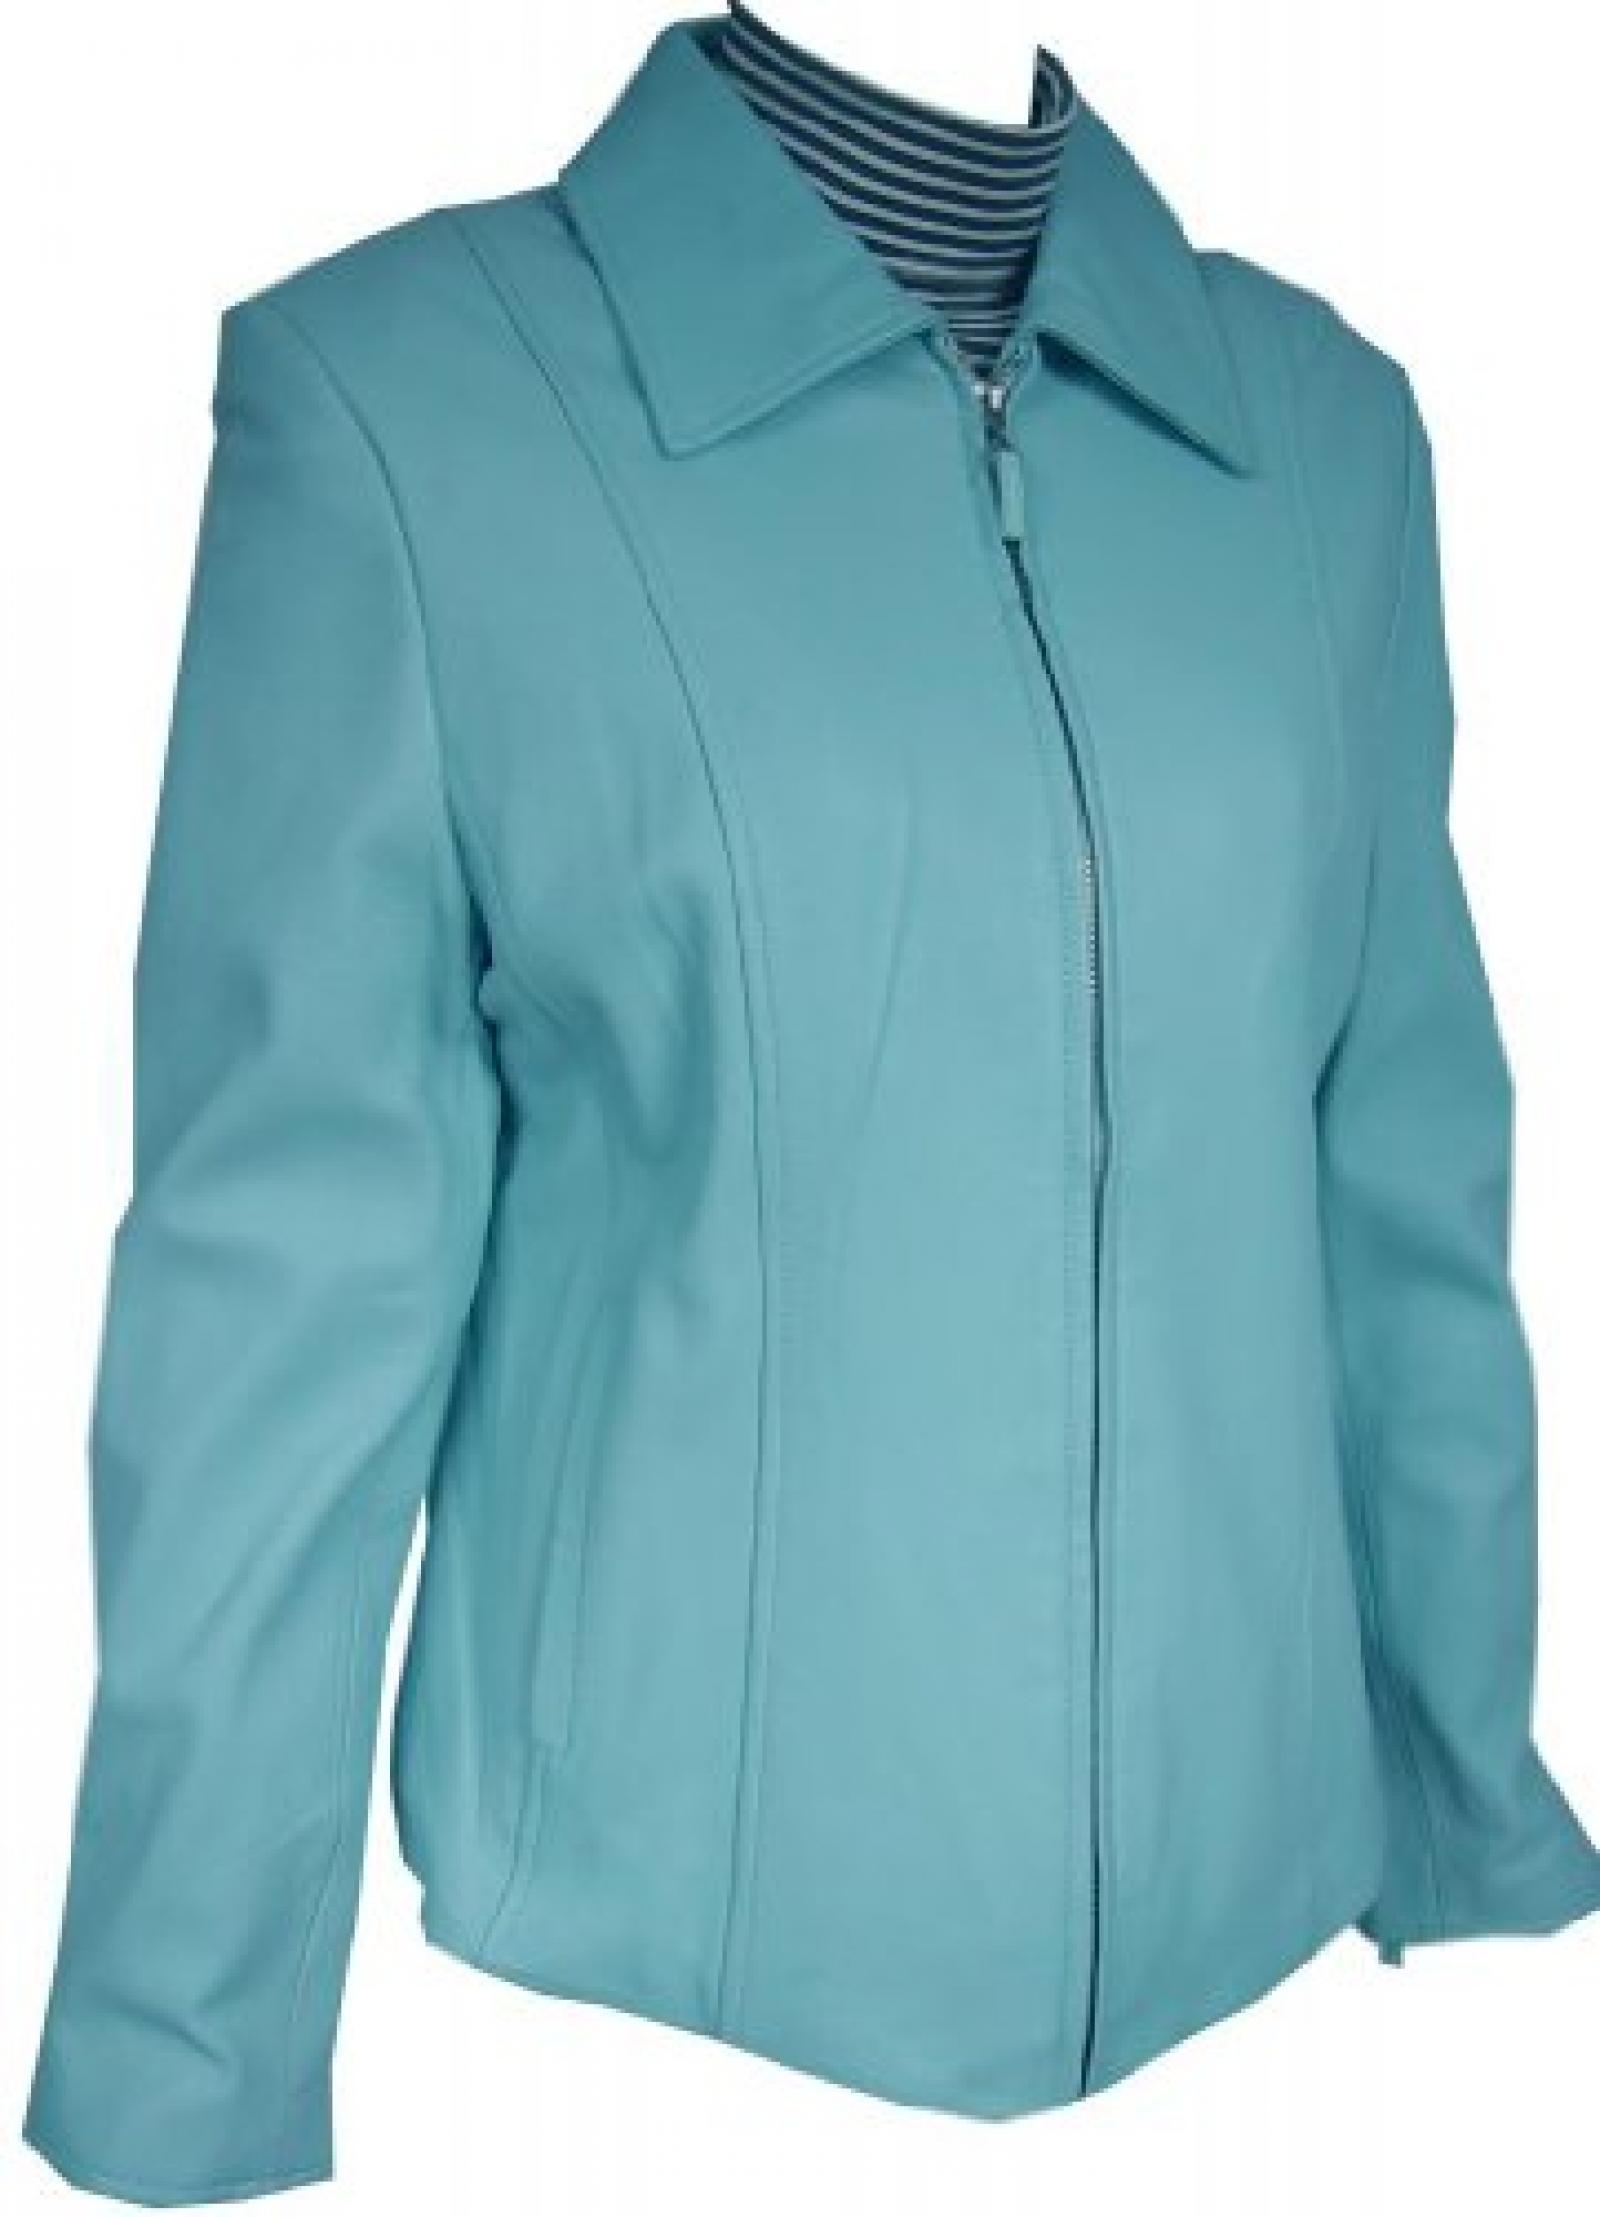 Paccilo FREE tailoring Women 4032 Lambskin Leather Scuba Jacket